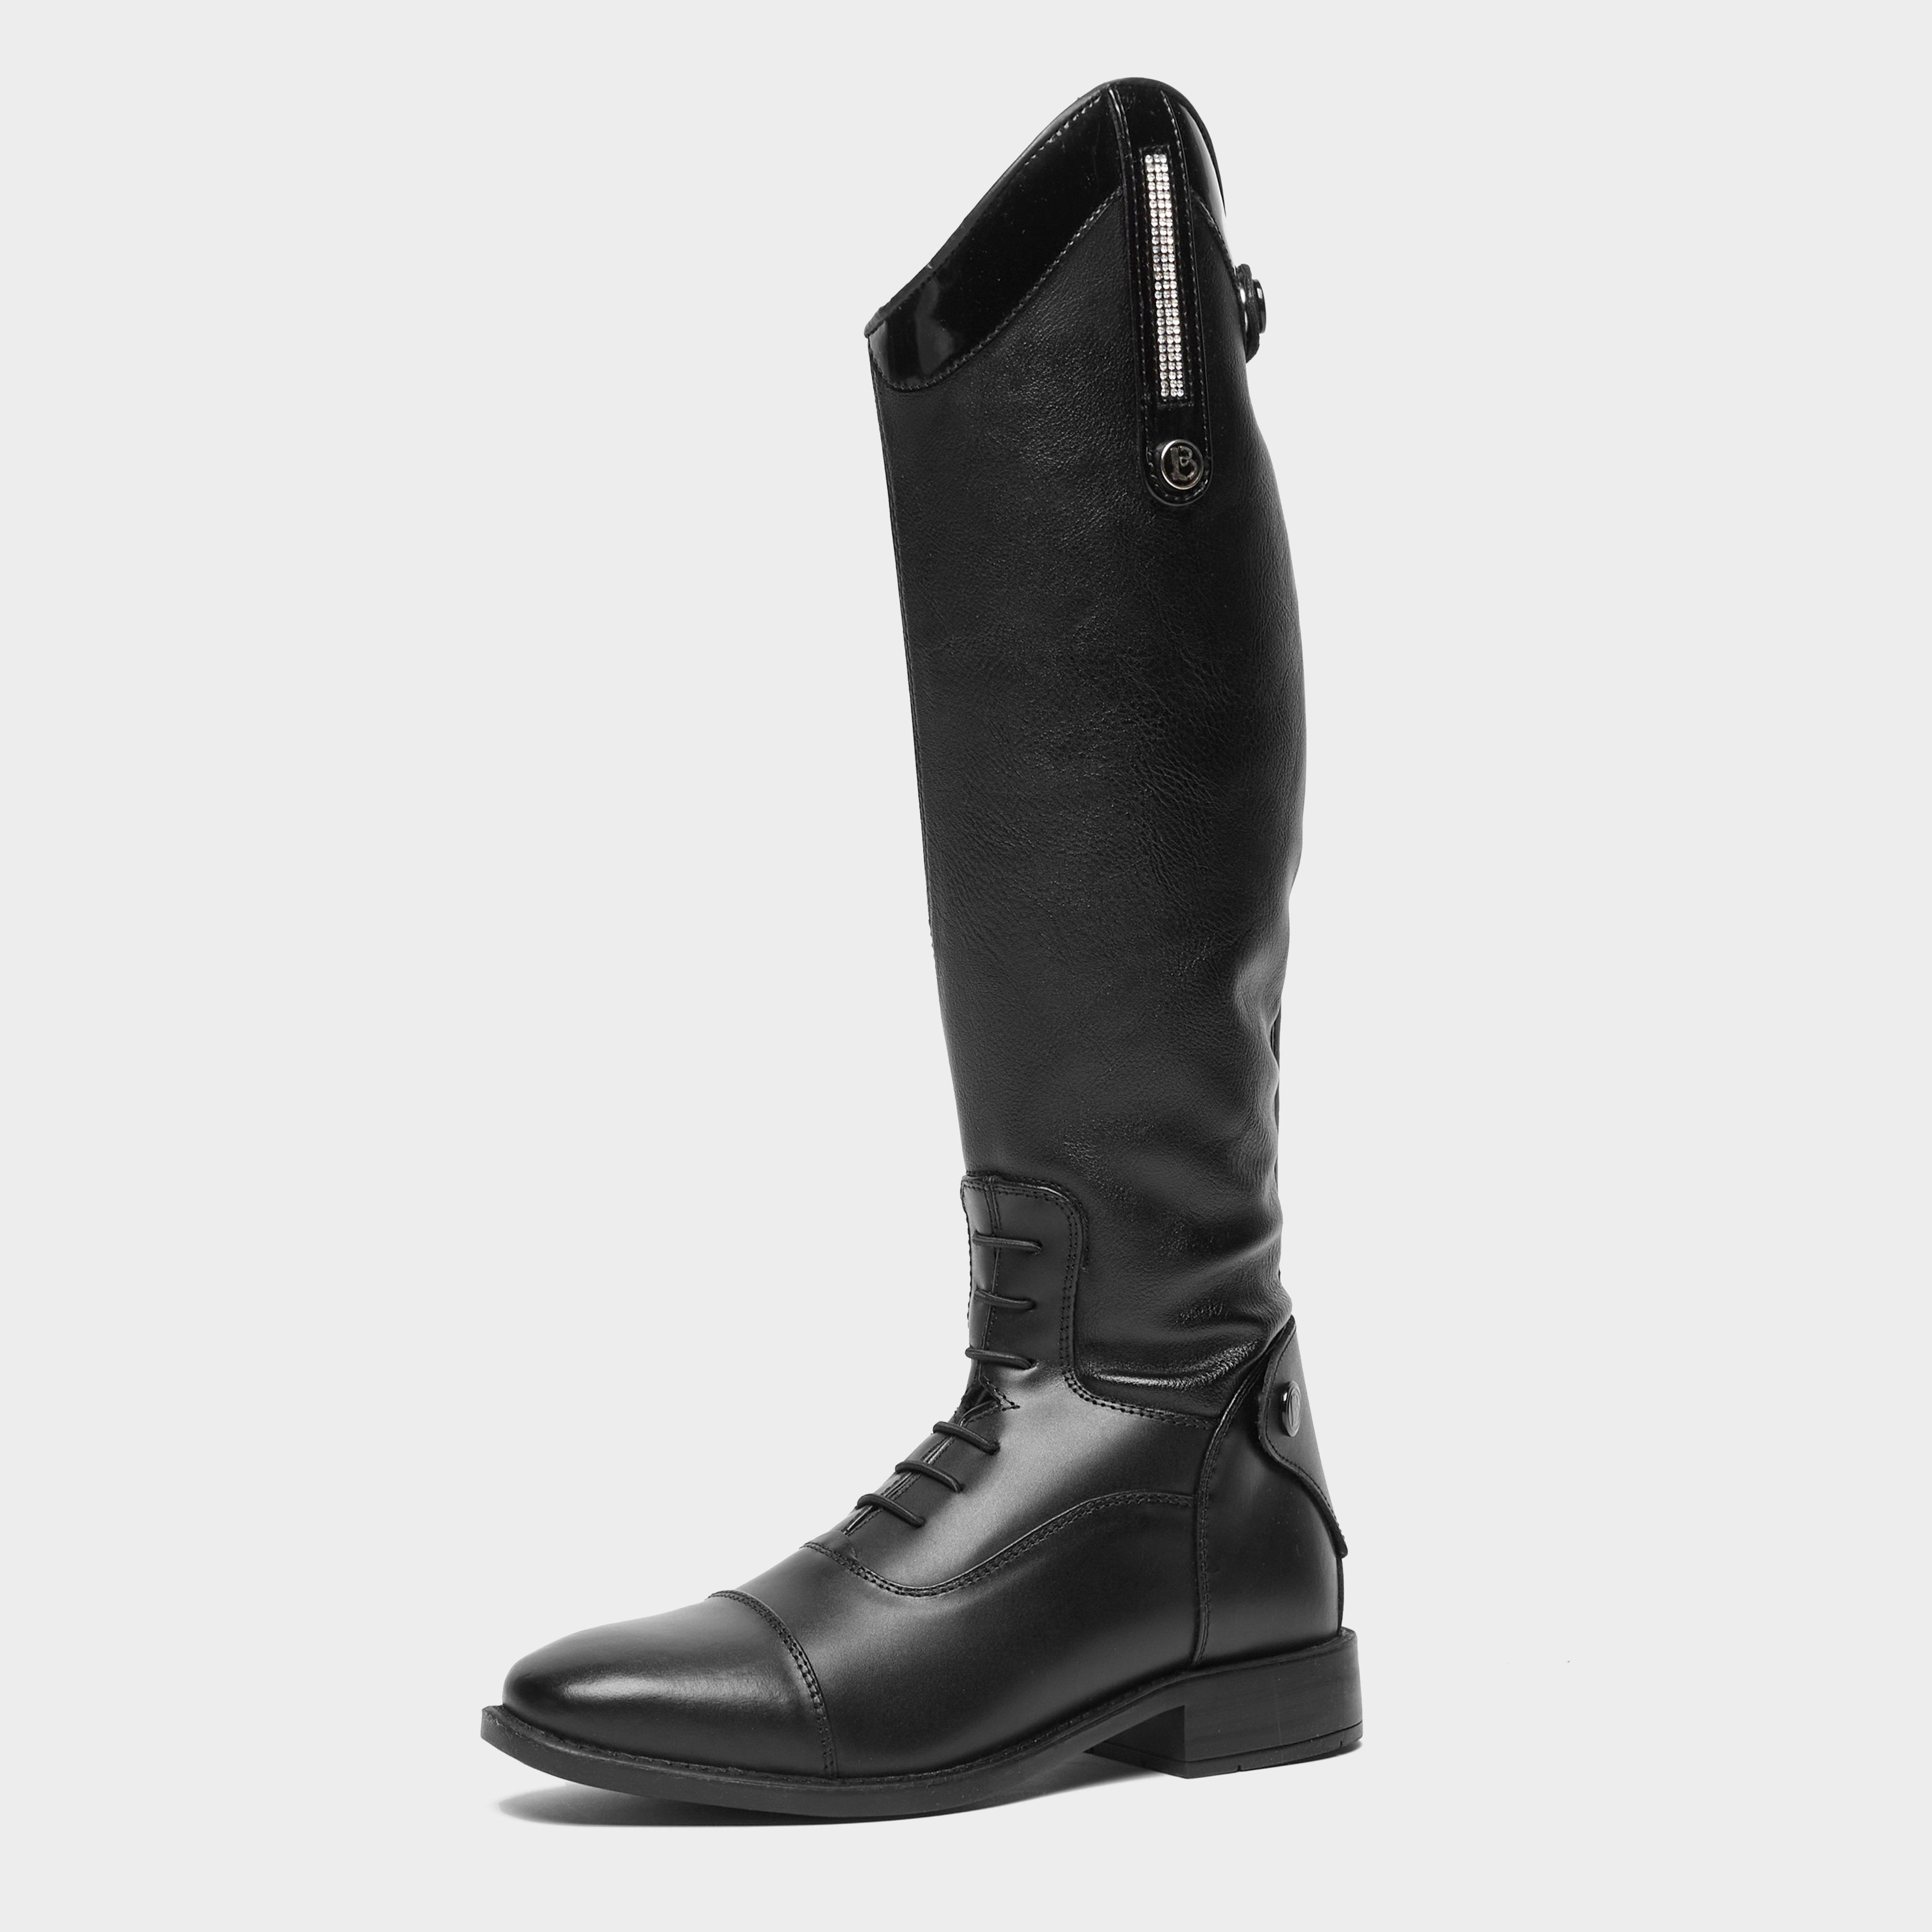 Brogini Kids Como Piccino Boot - Black/Black, Black